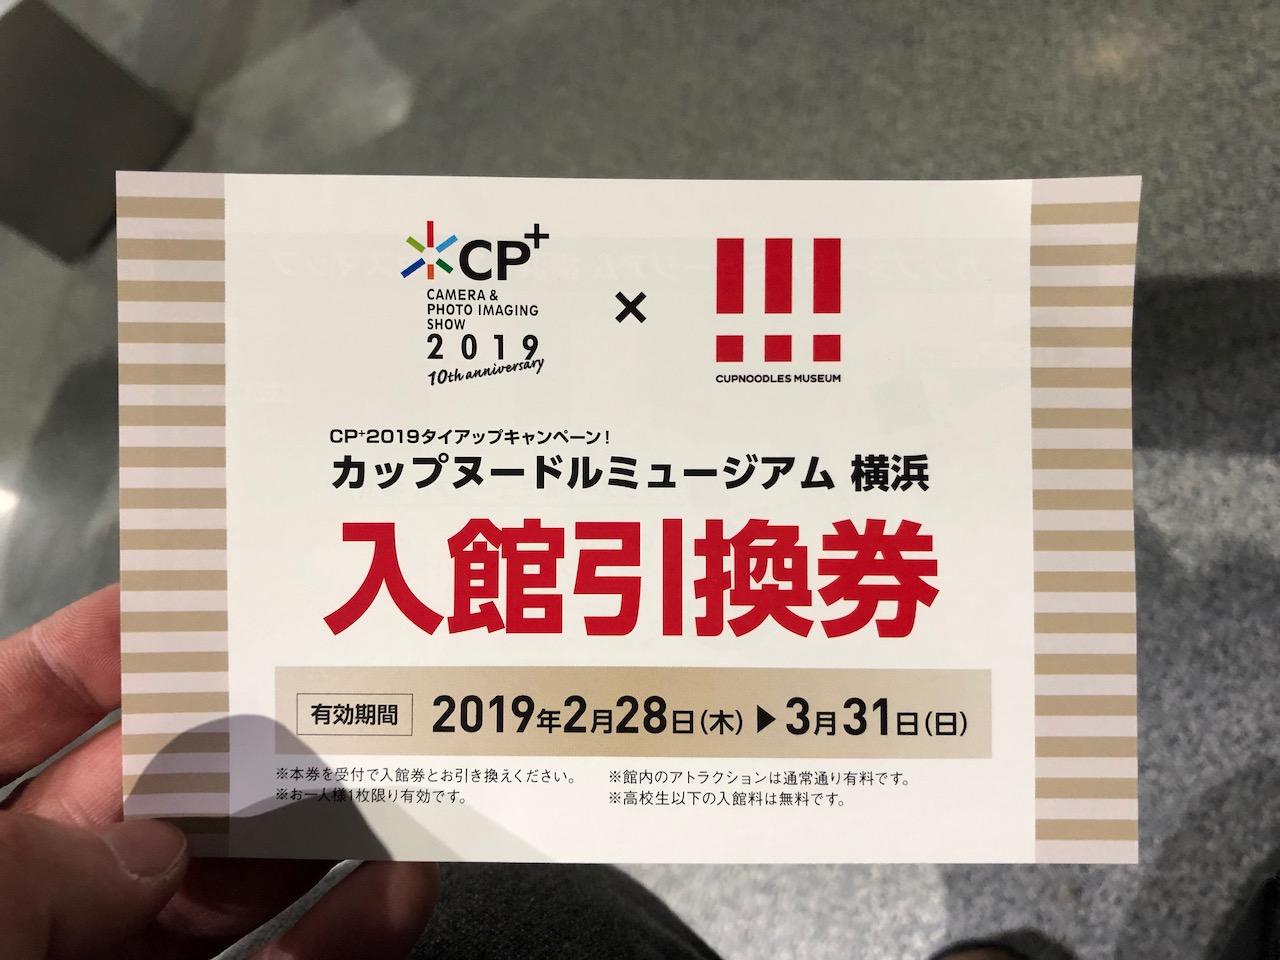 CP+(シーピープラス)2019をiPhoneで撮ったよ♪